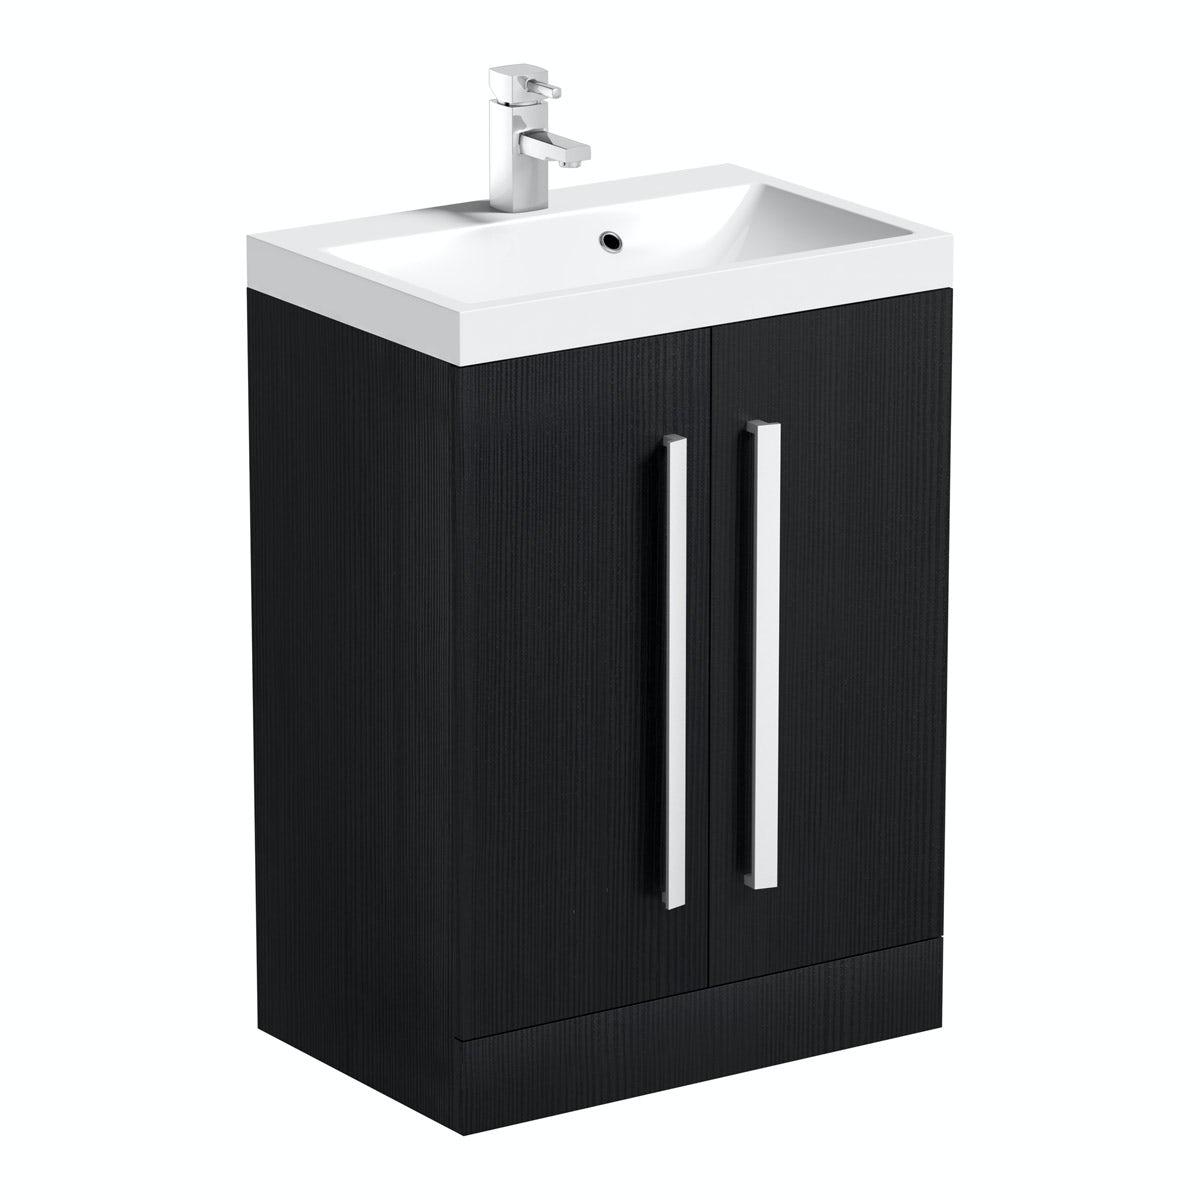 Orchard Wye essen black floorstanding vanity unit and basin 600mm